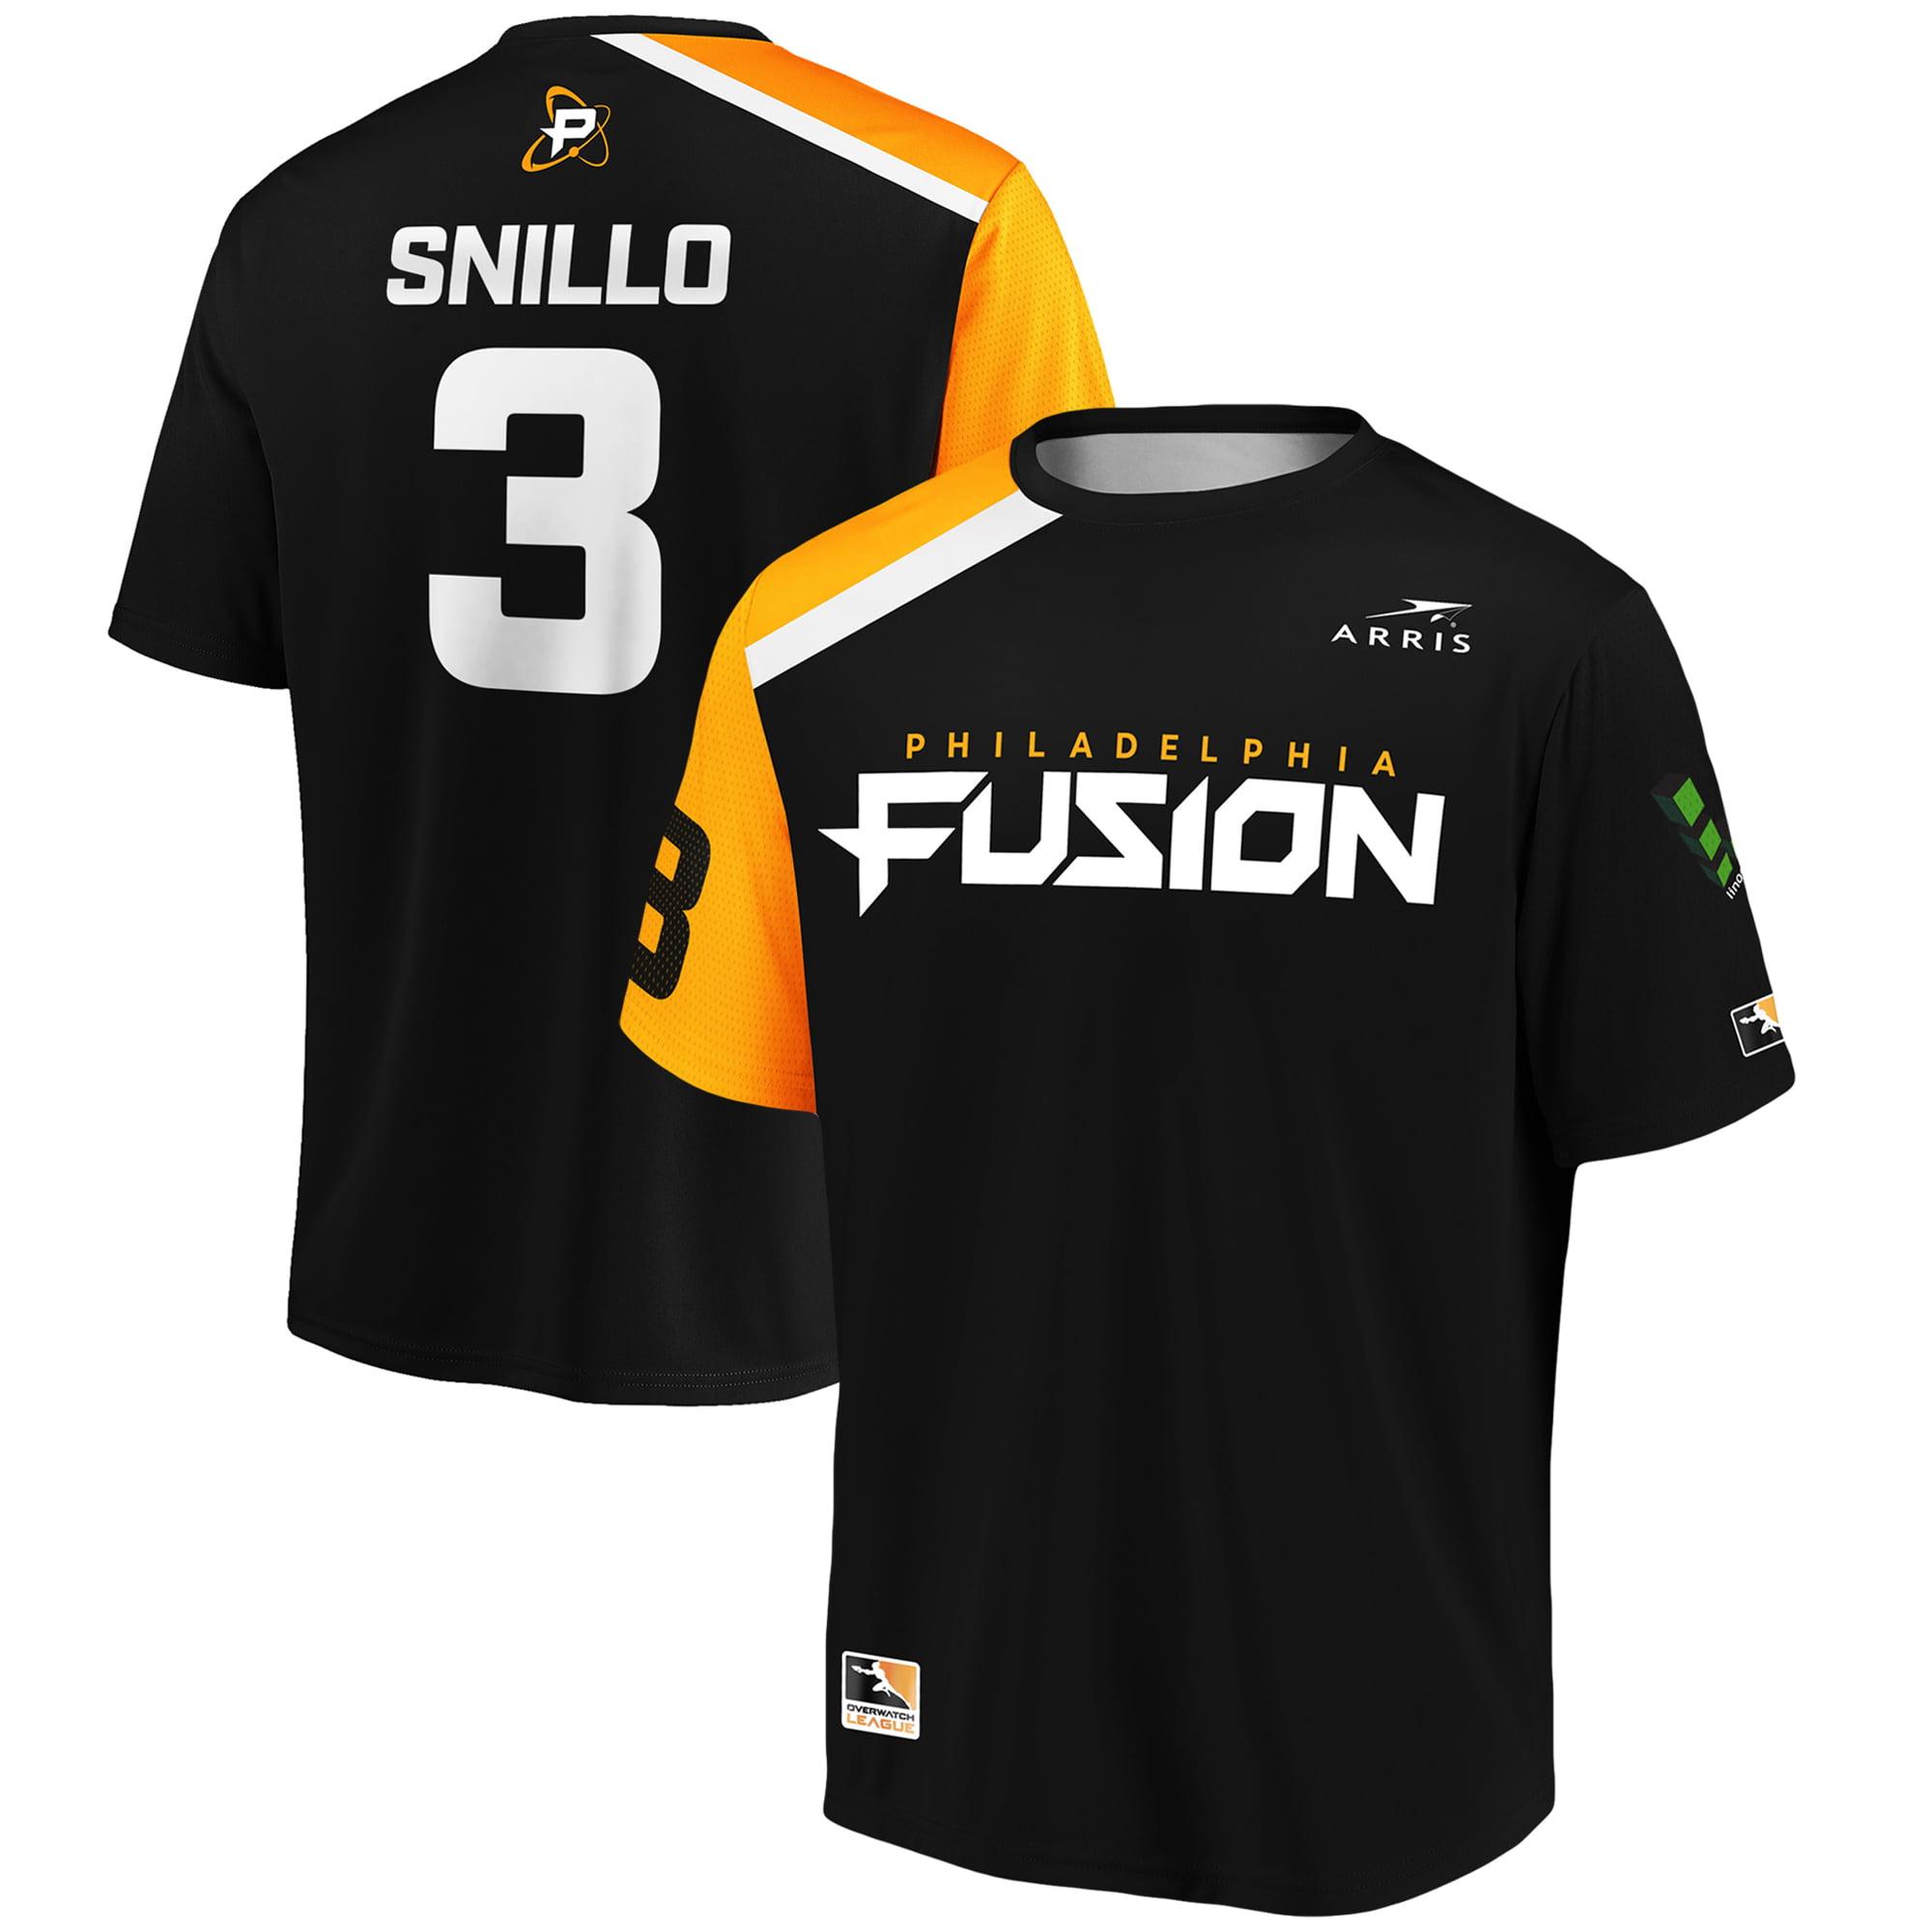 snillo Philadelphia Fusion Overwatch League Replica Home Jersey - Black